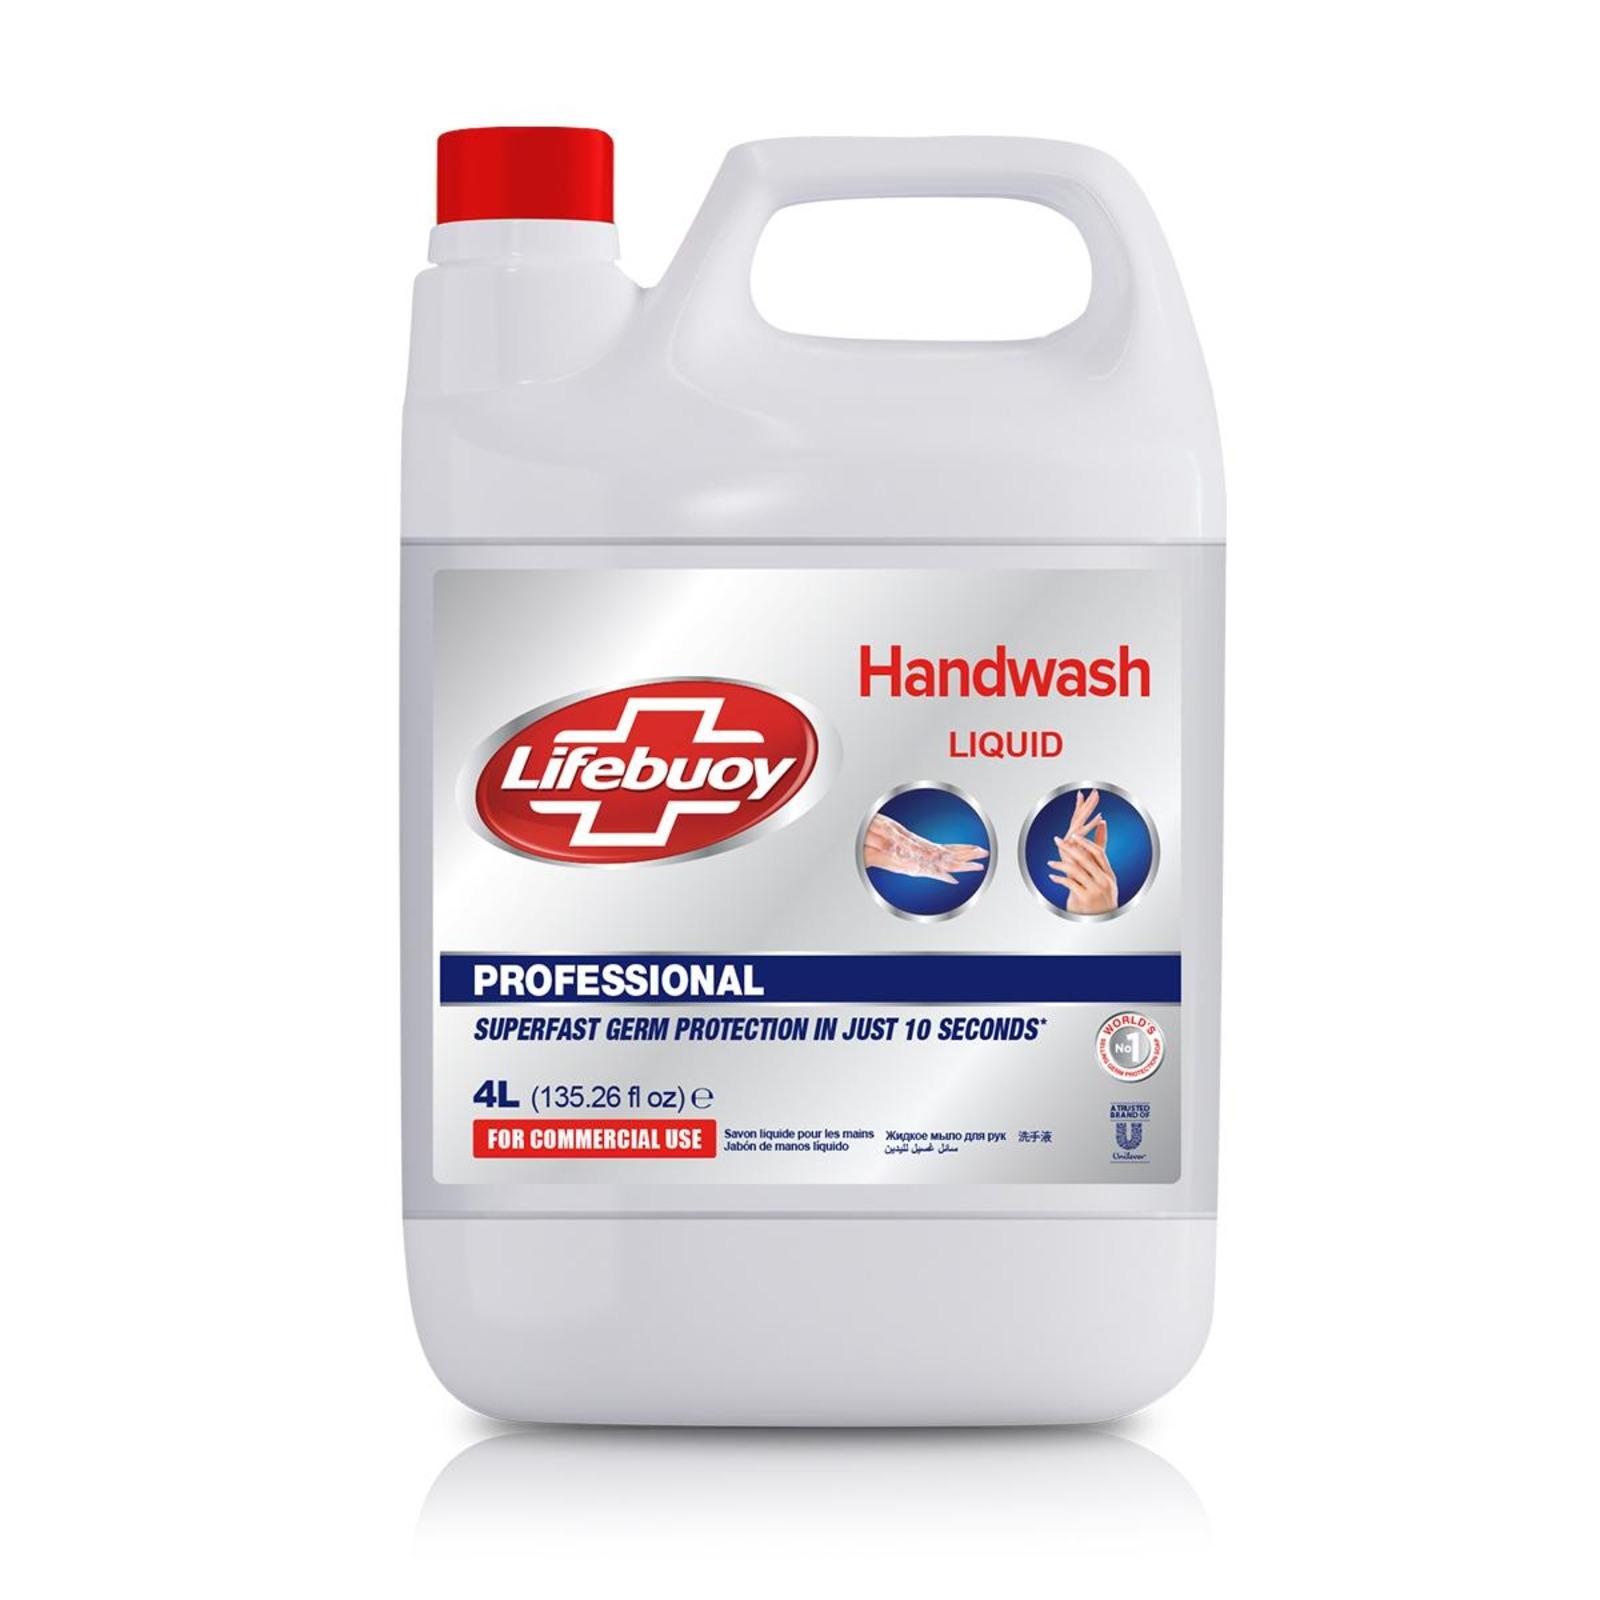 UNILEVER UL-LB-HANDWASH-4L LIFEBUOY PRO HAND WASH